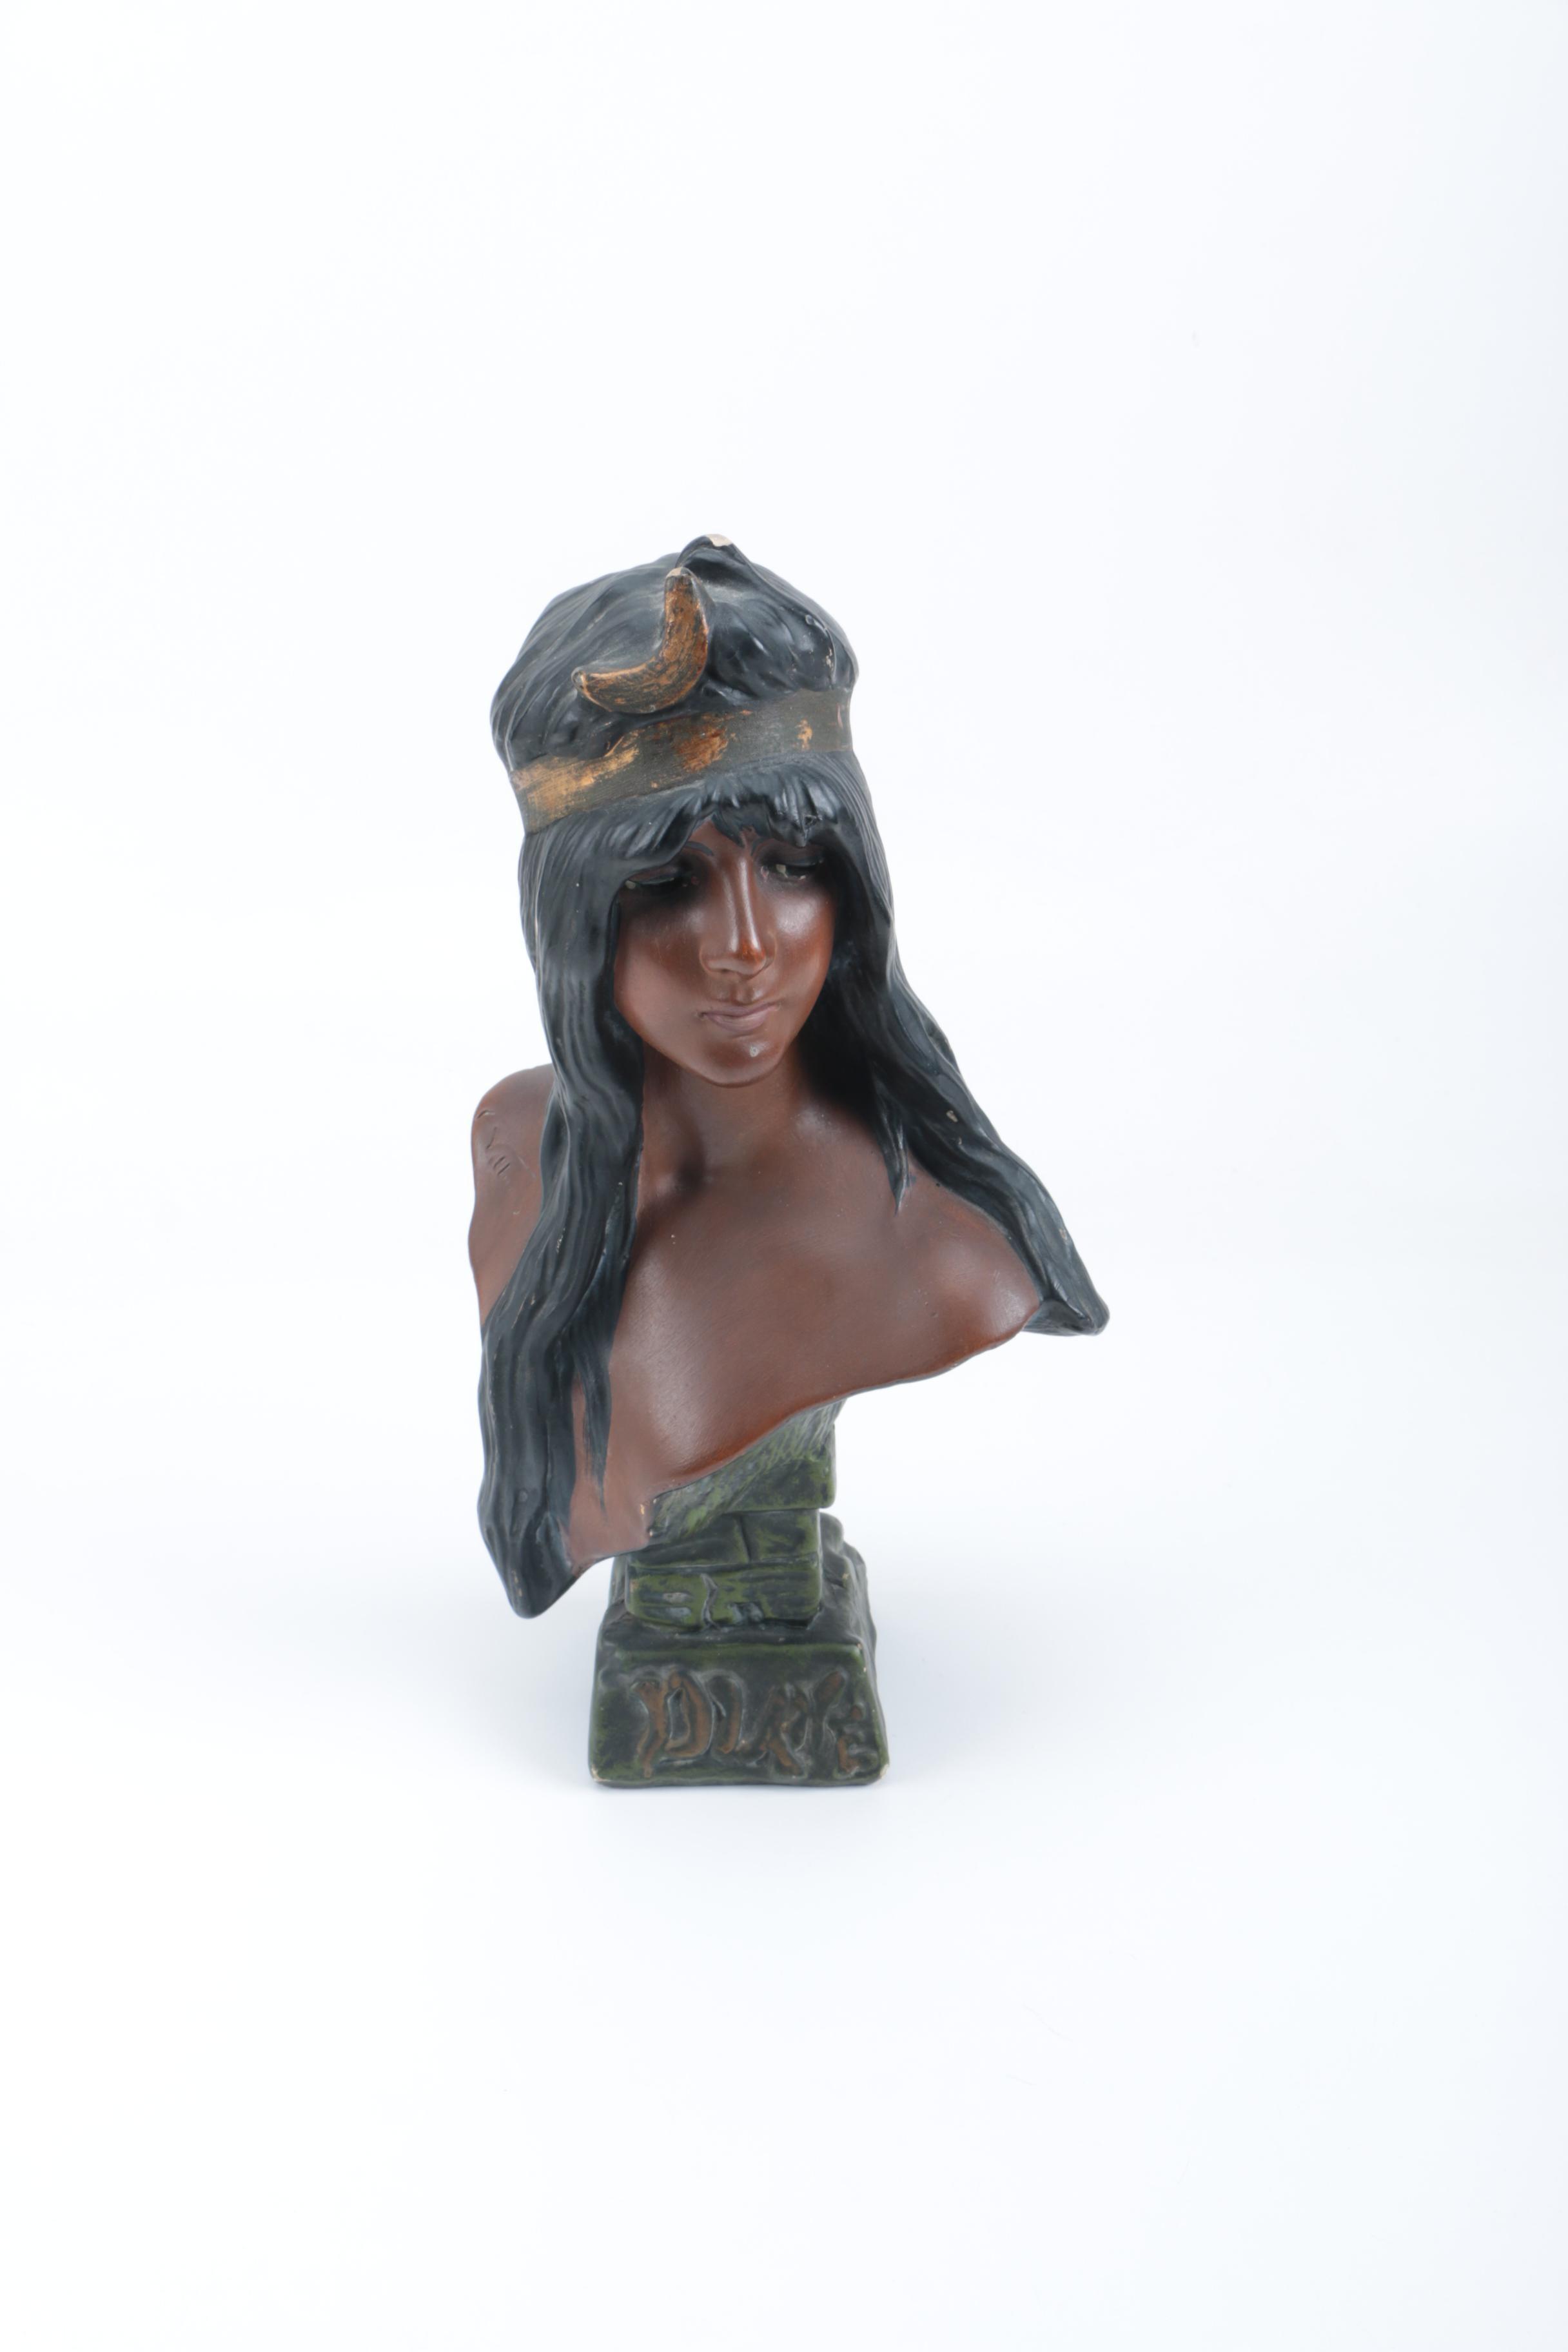 Bust Of Art Noveou Woman Attributed To Emmanuel Villanis